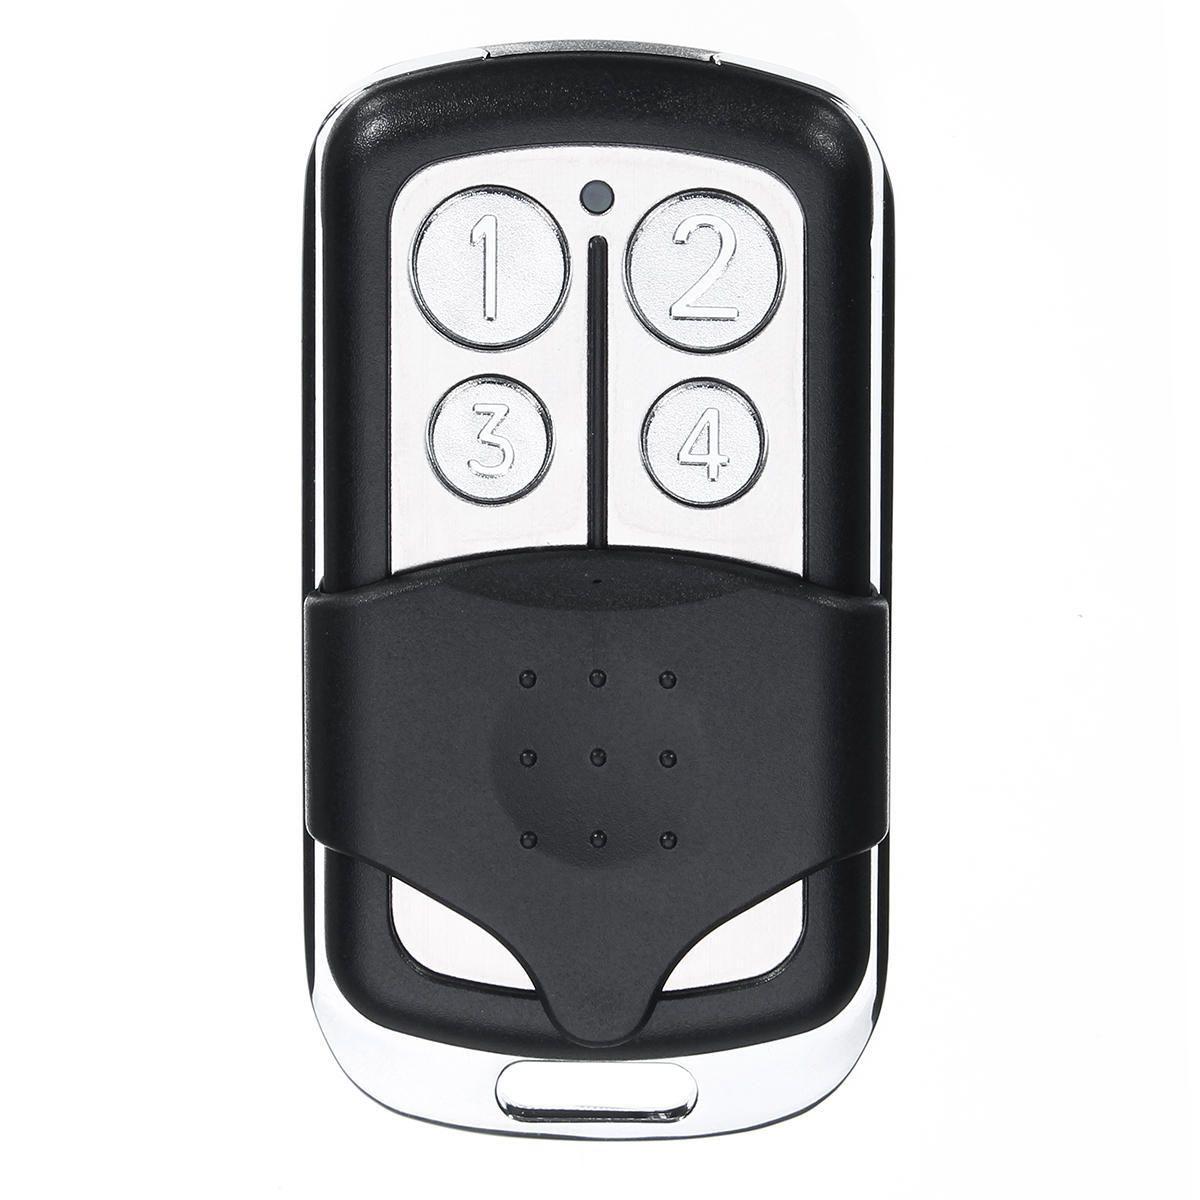 Compatible 4 Button Mini Garage Door Opener Remote Key Secur…